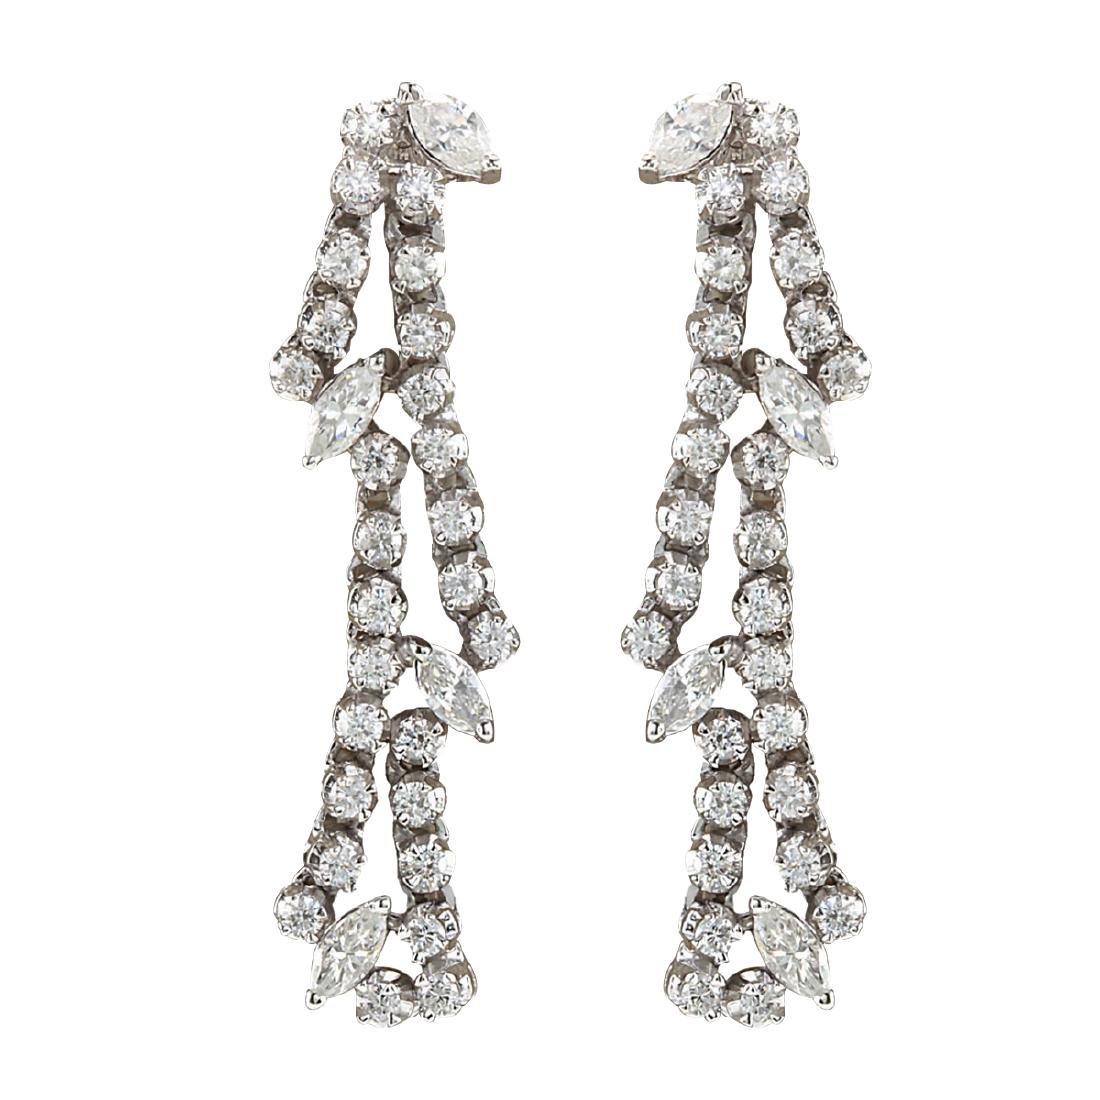 4.00CTW Natural Diamond Earrings 18K Solid White Gold